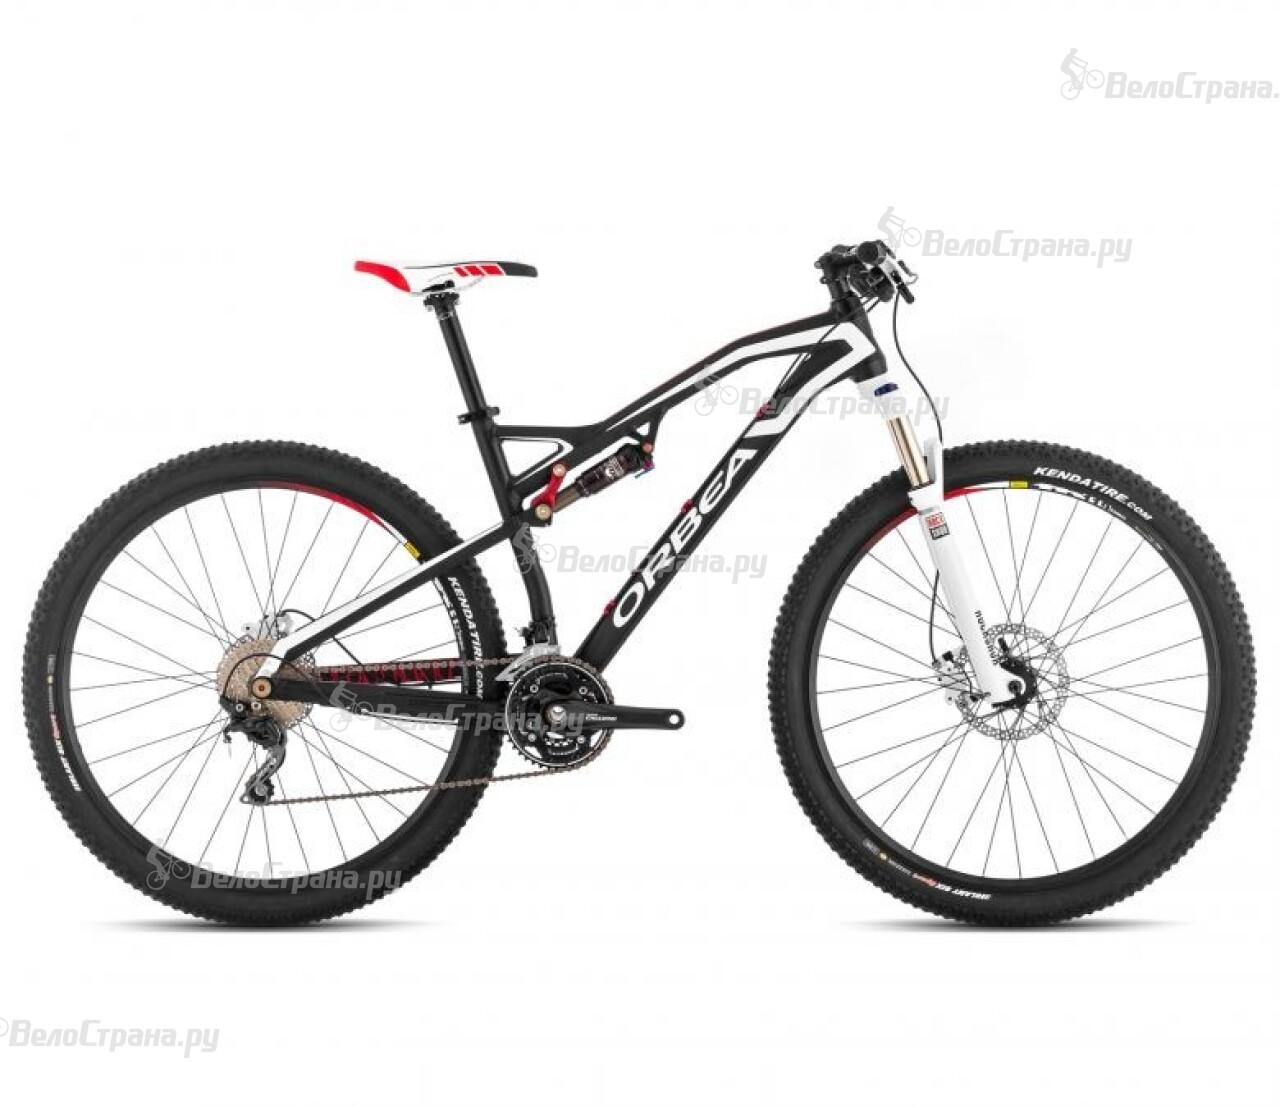 все цены на Велосипед Orbea Occam 29 H50 (2014) онлайн